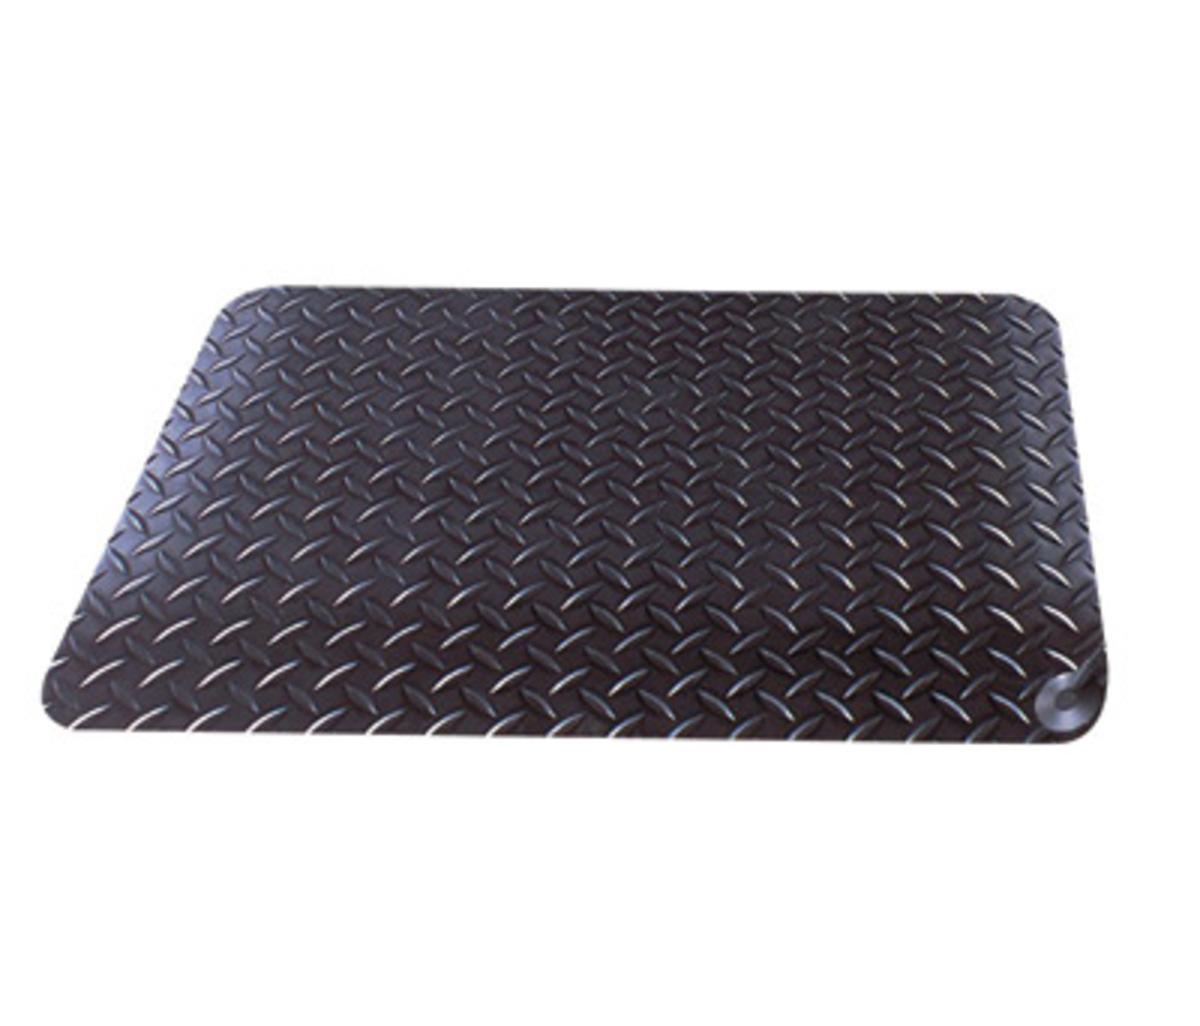 Notrax Floor Matting Notrax Rubber Brush Floor Matting